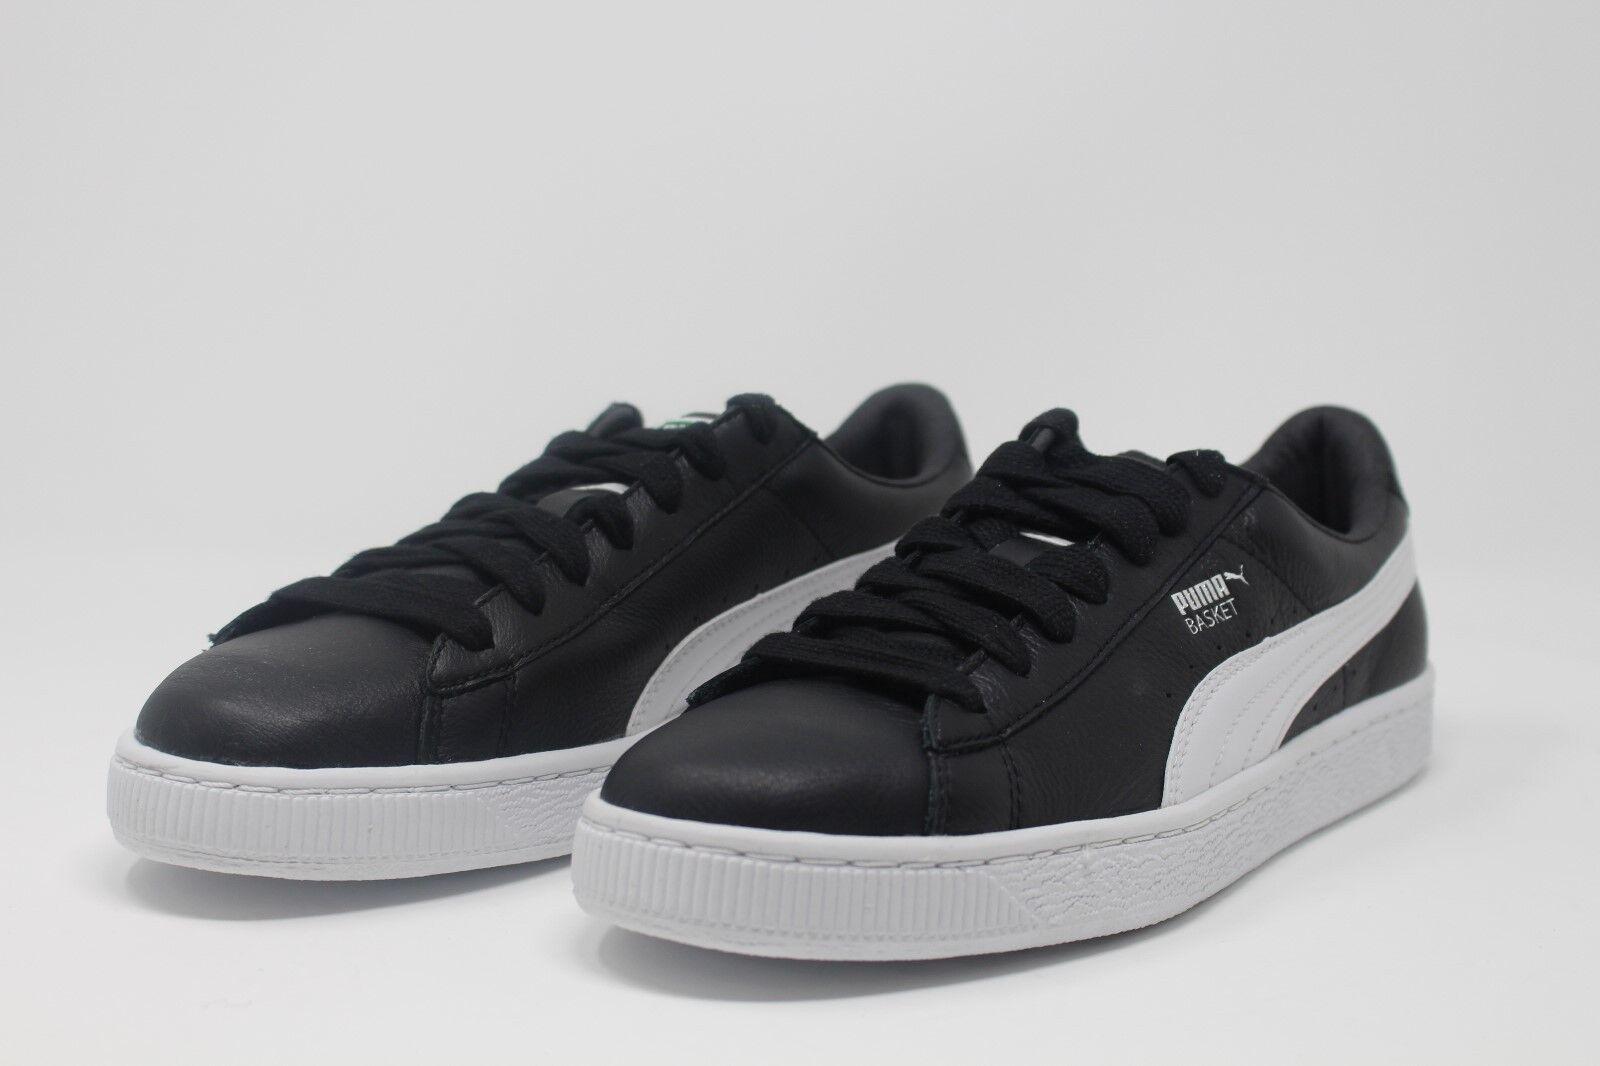 Puma Basket Classic LFS Black/White 354367-21 Sizes 8-14